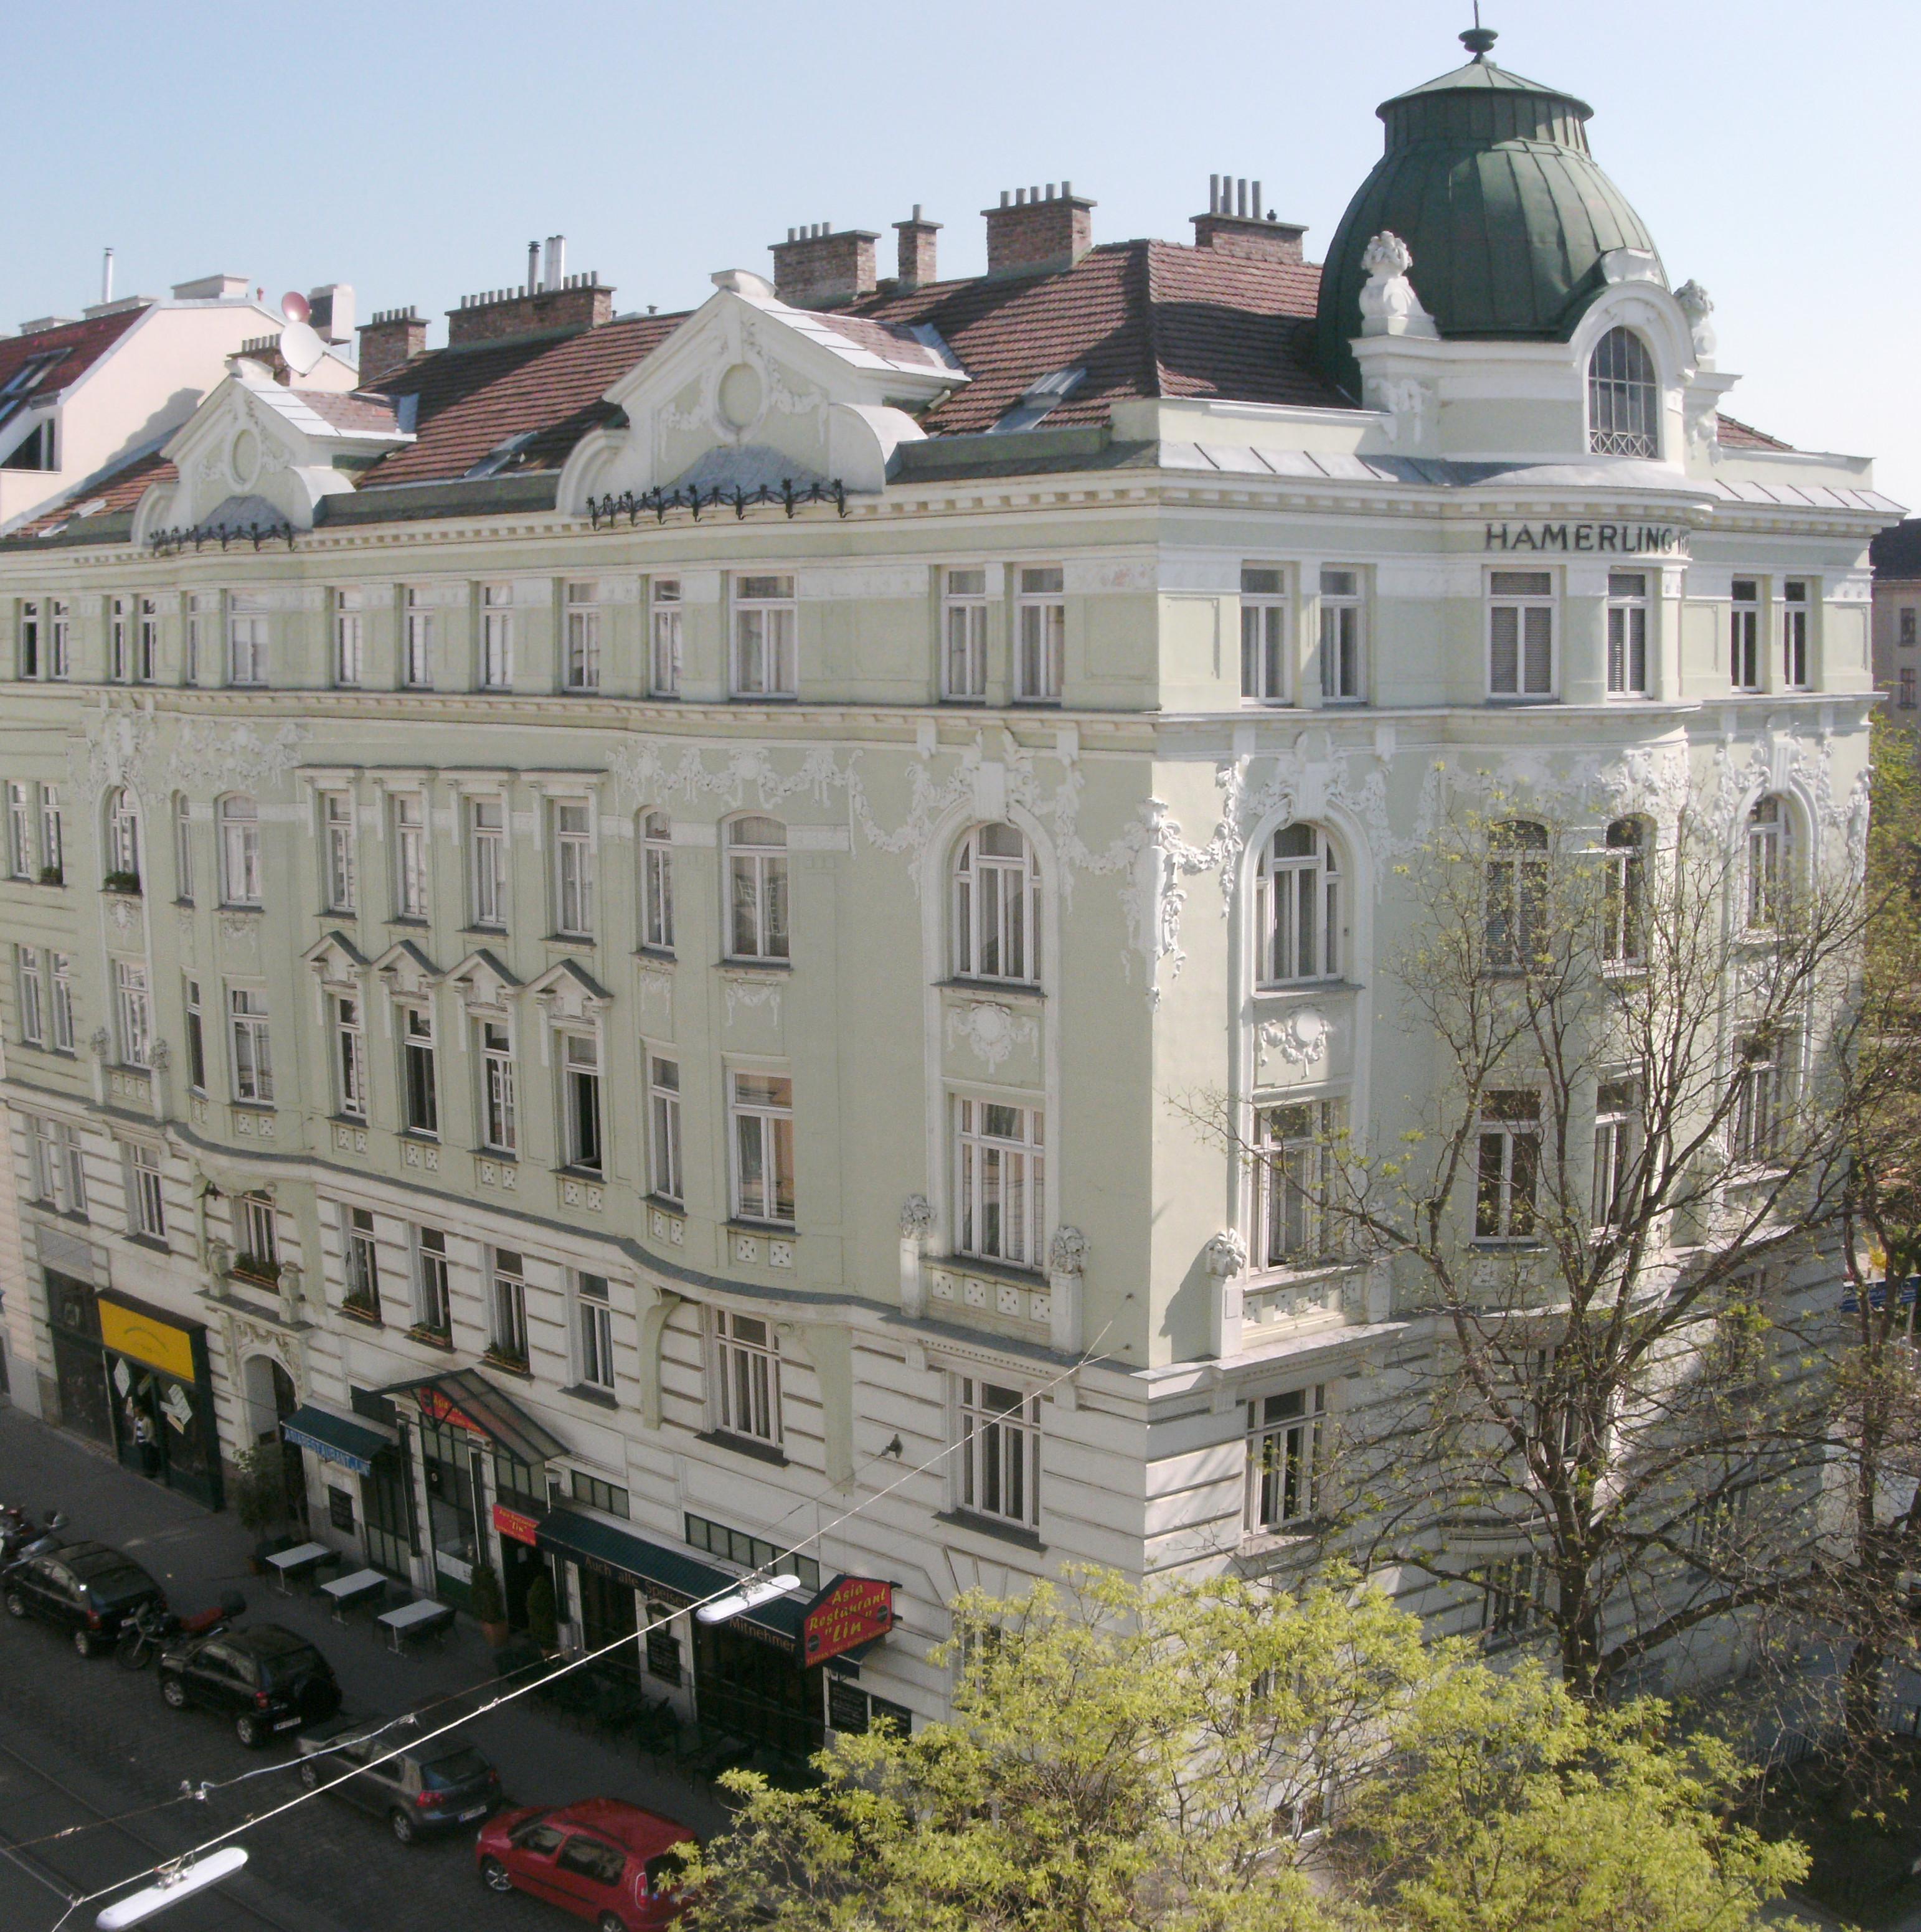 Albertgasse 30 Hamerlinghof.JPG